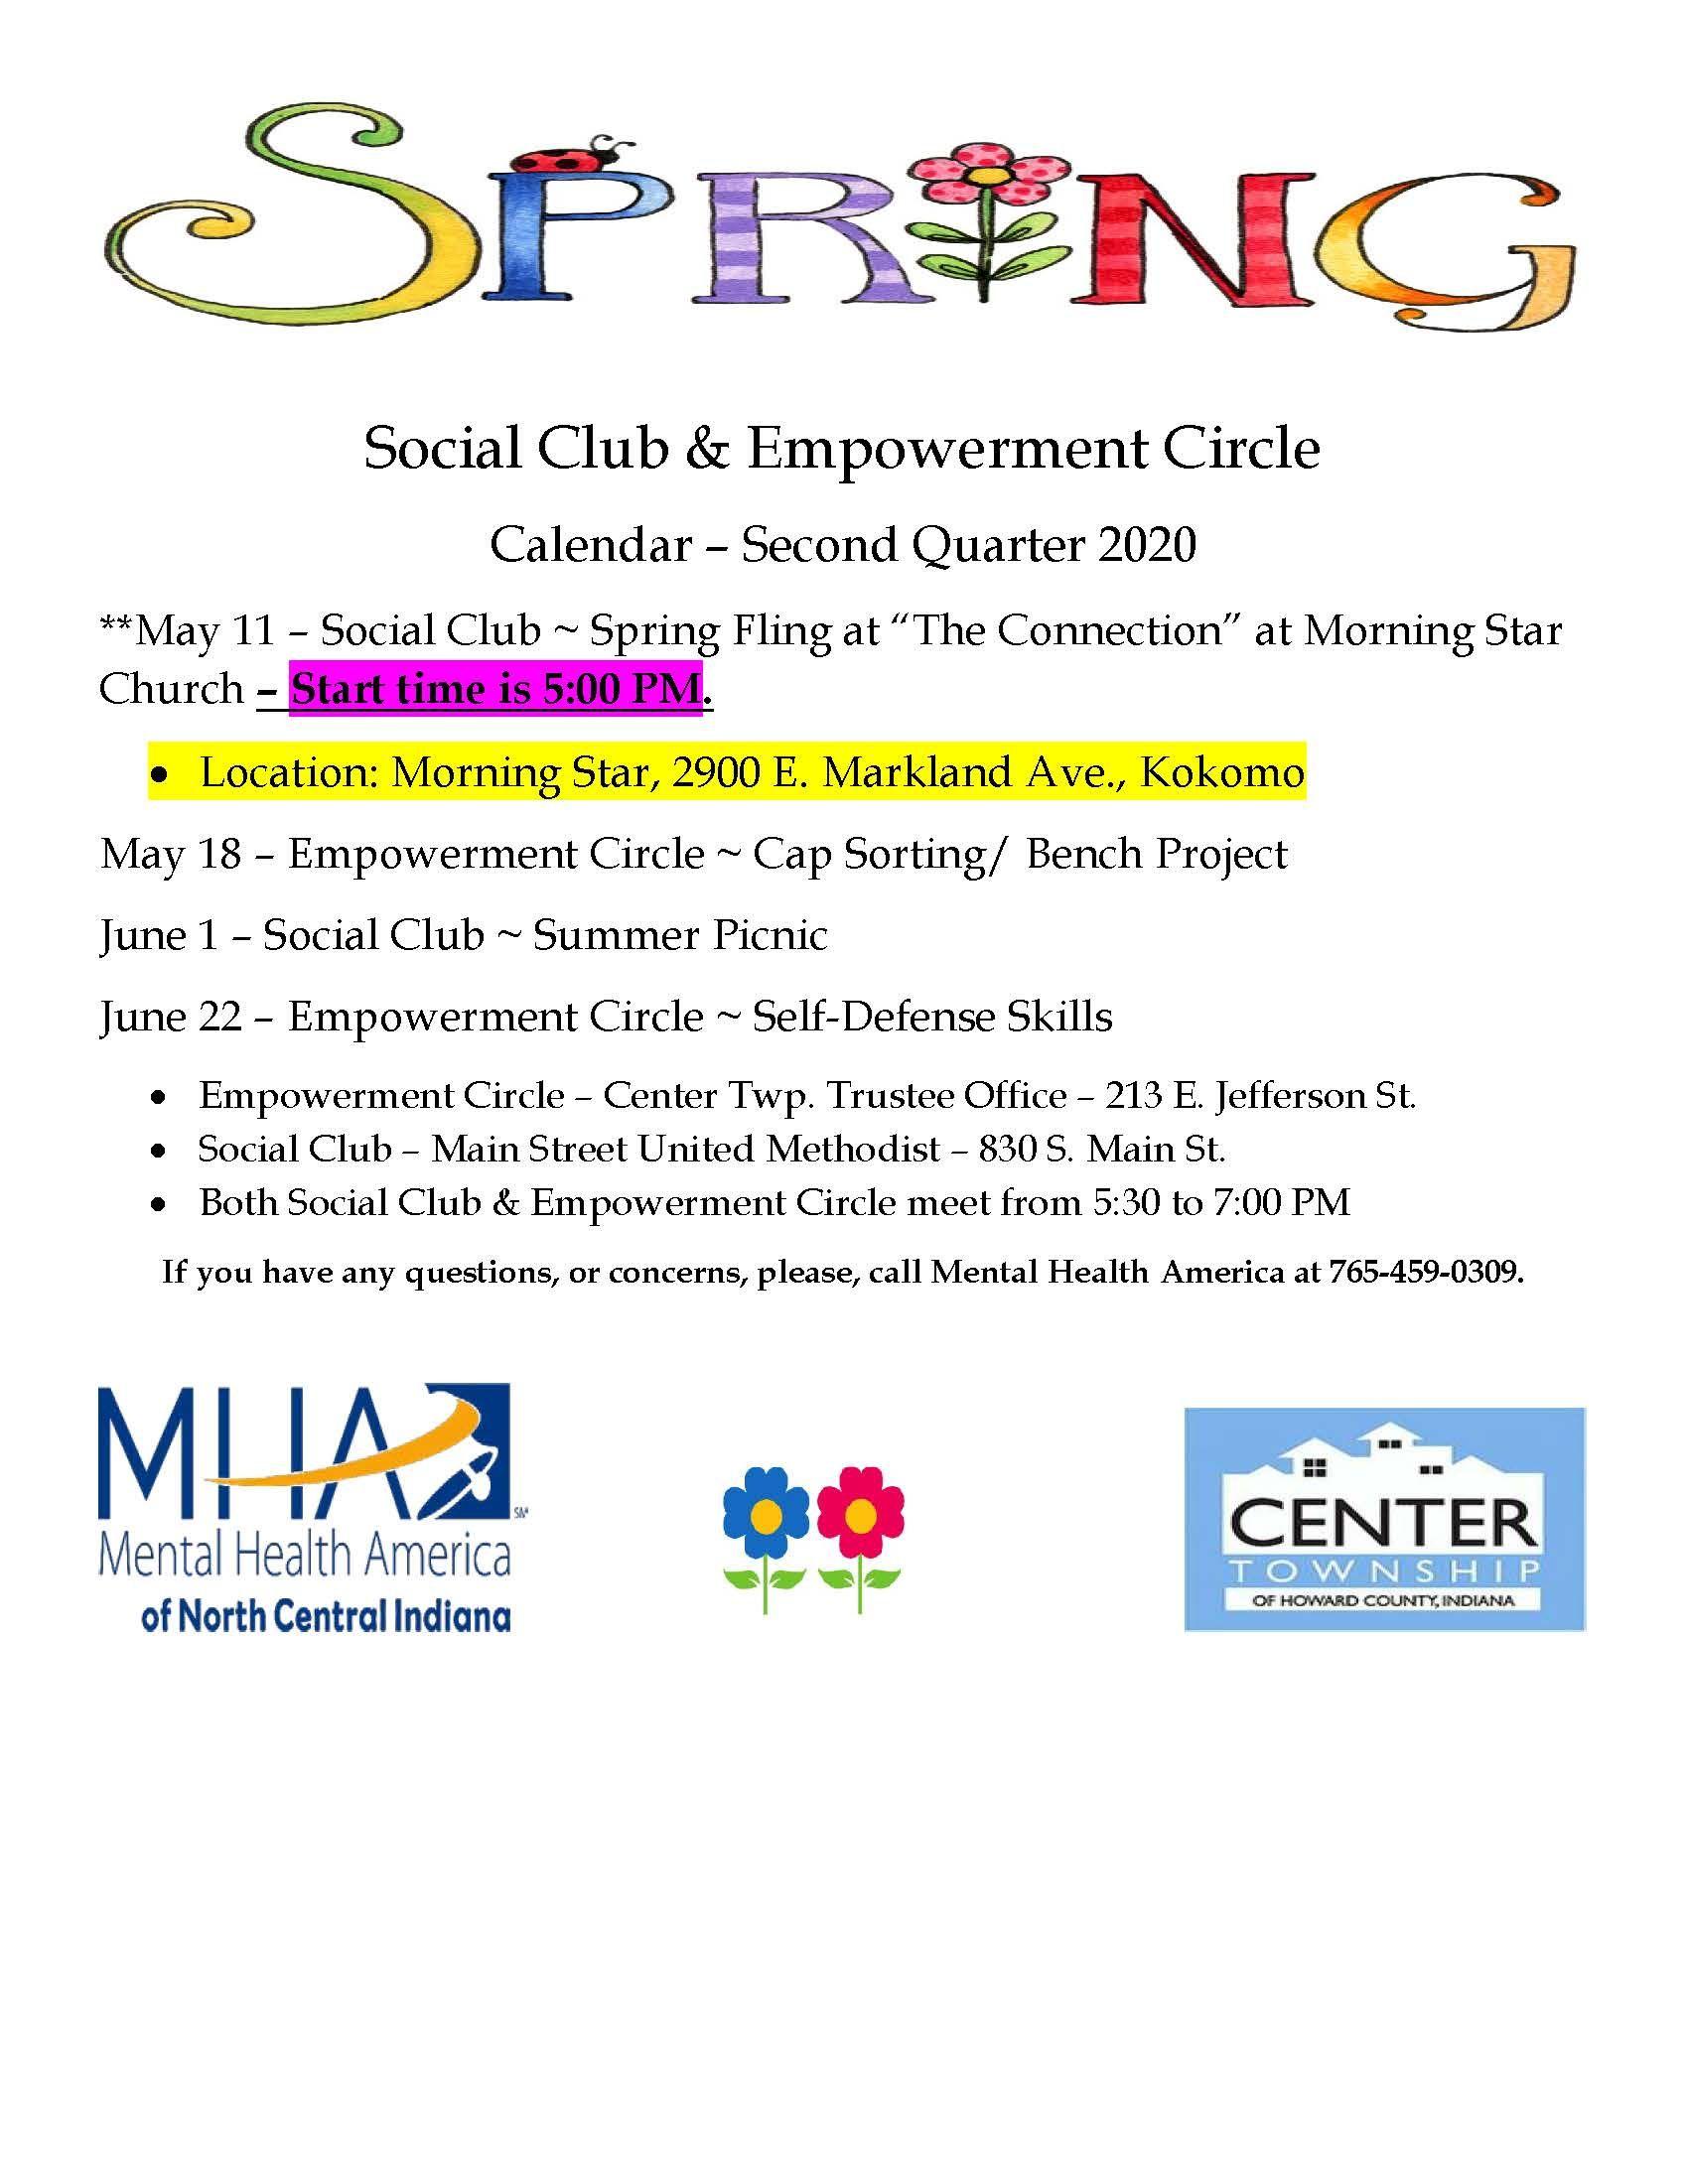 Social Club / Empowerment Circle - 2nd Qtr Calendar 2020 - UPDATED